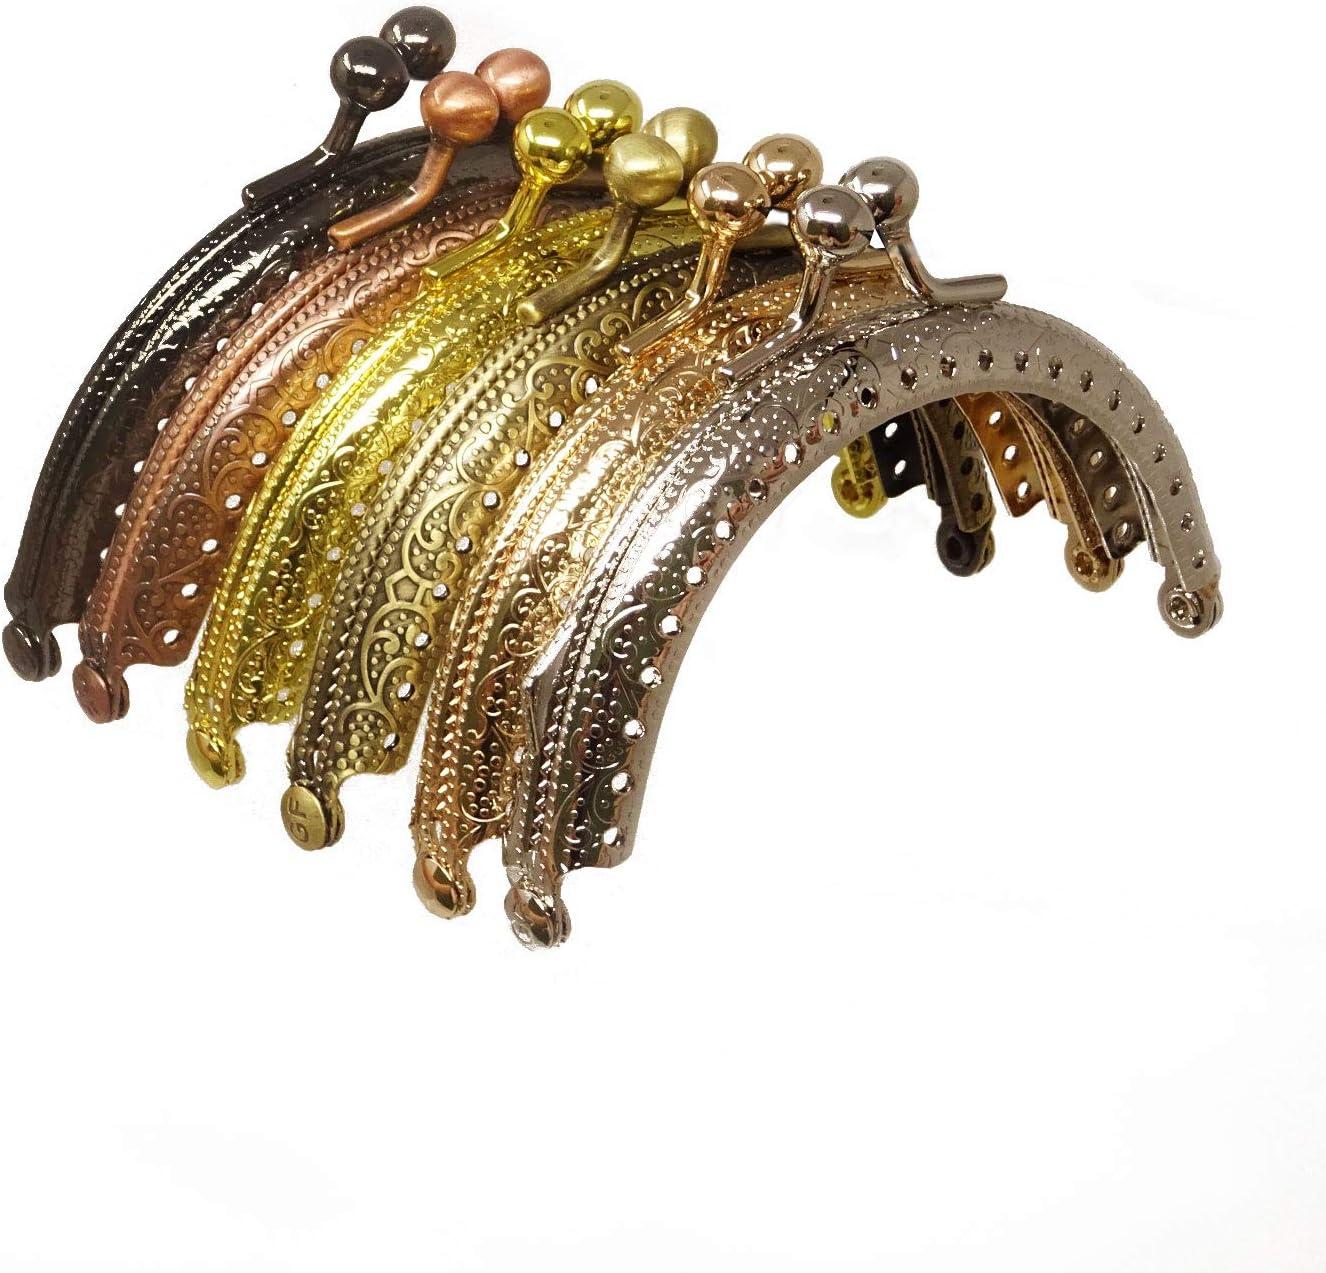 Honbay 6PCS Metal Half Round Purse Frame Coin Bag Kiss Clasp Lock for Purse Making